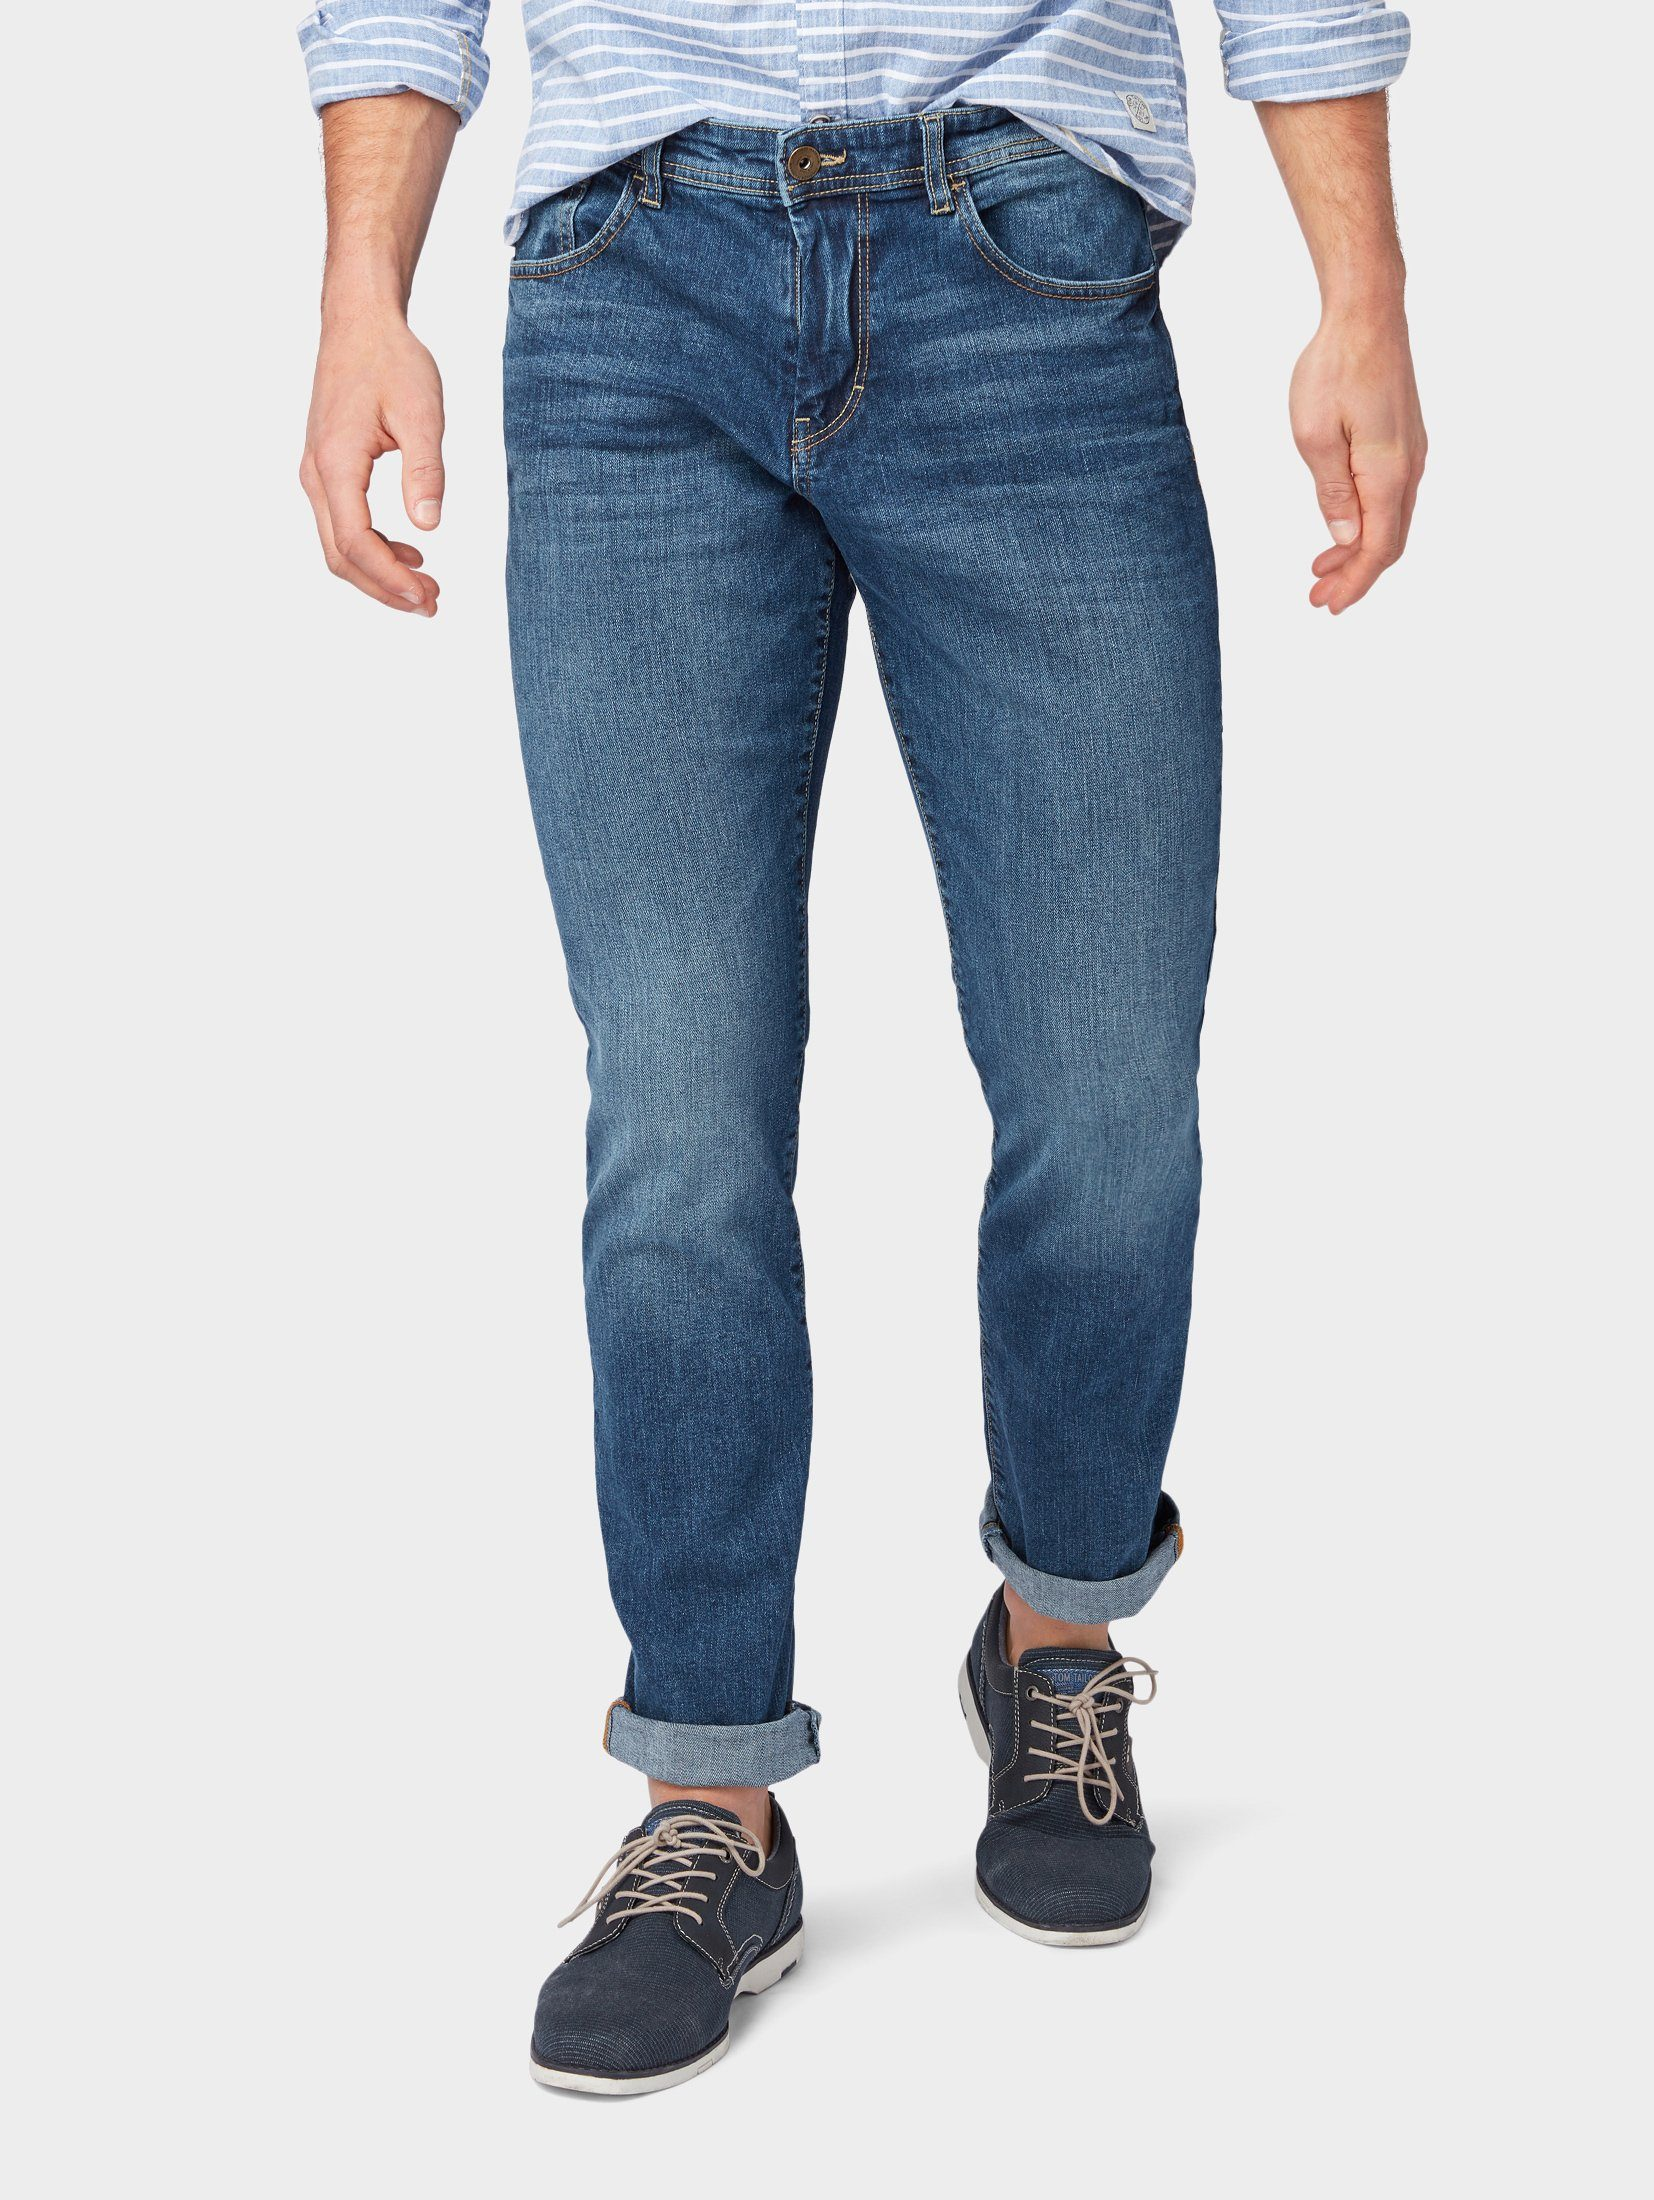 TOM TAILOR Slim fit Jeans »Josh Regular Slim Jeans« online kaufen | OTTO